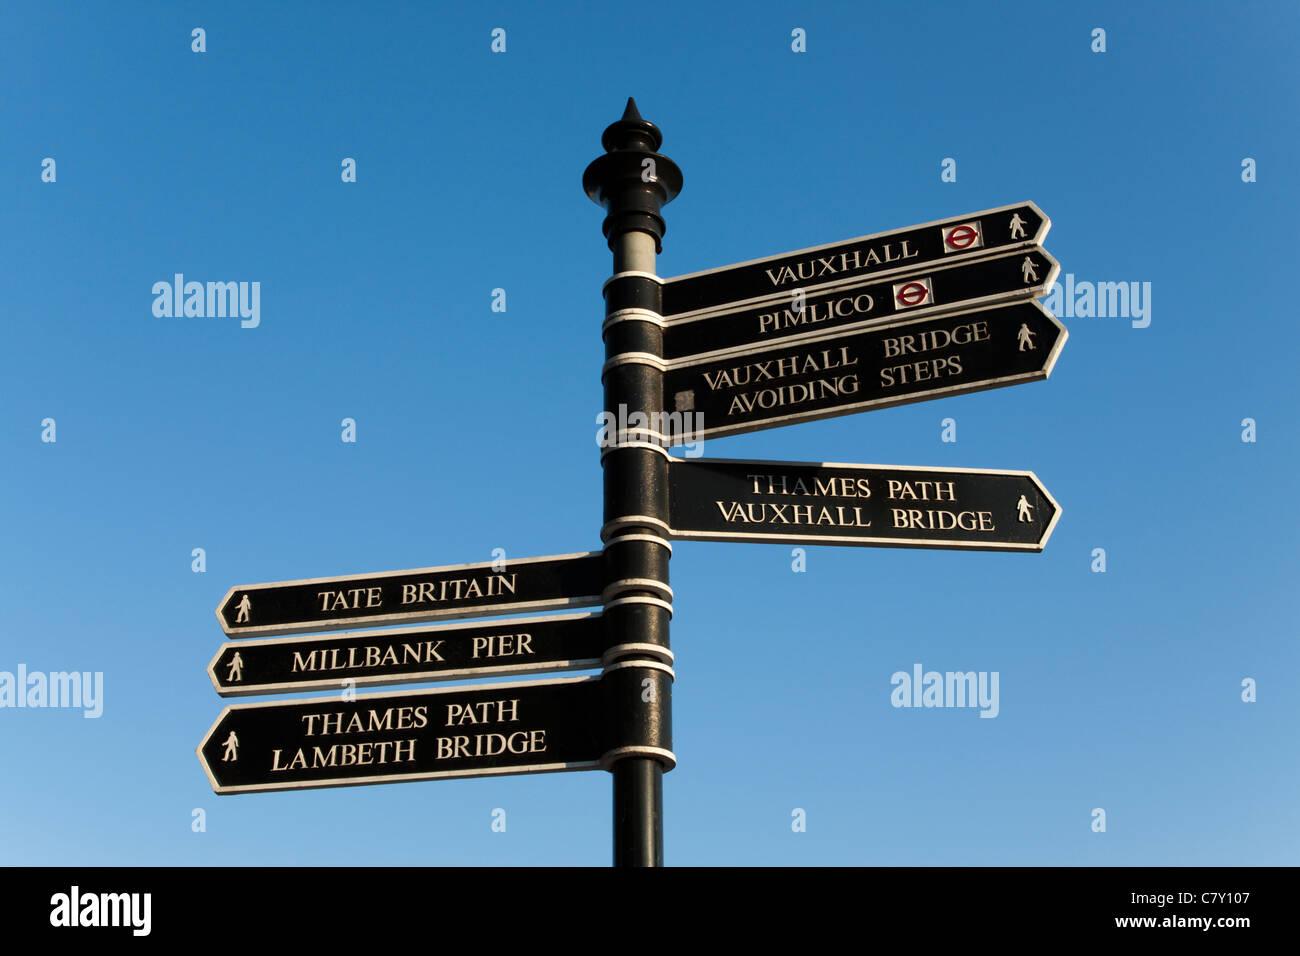 Signpost, Thames Path, London, England, UK - Stock Image